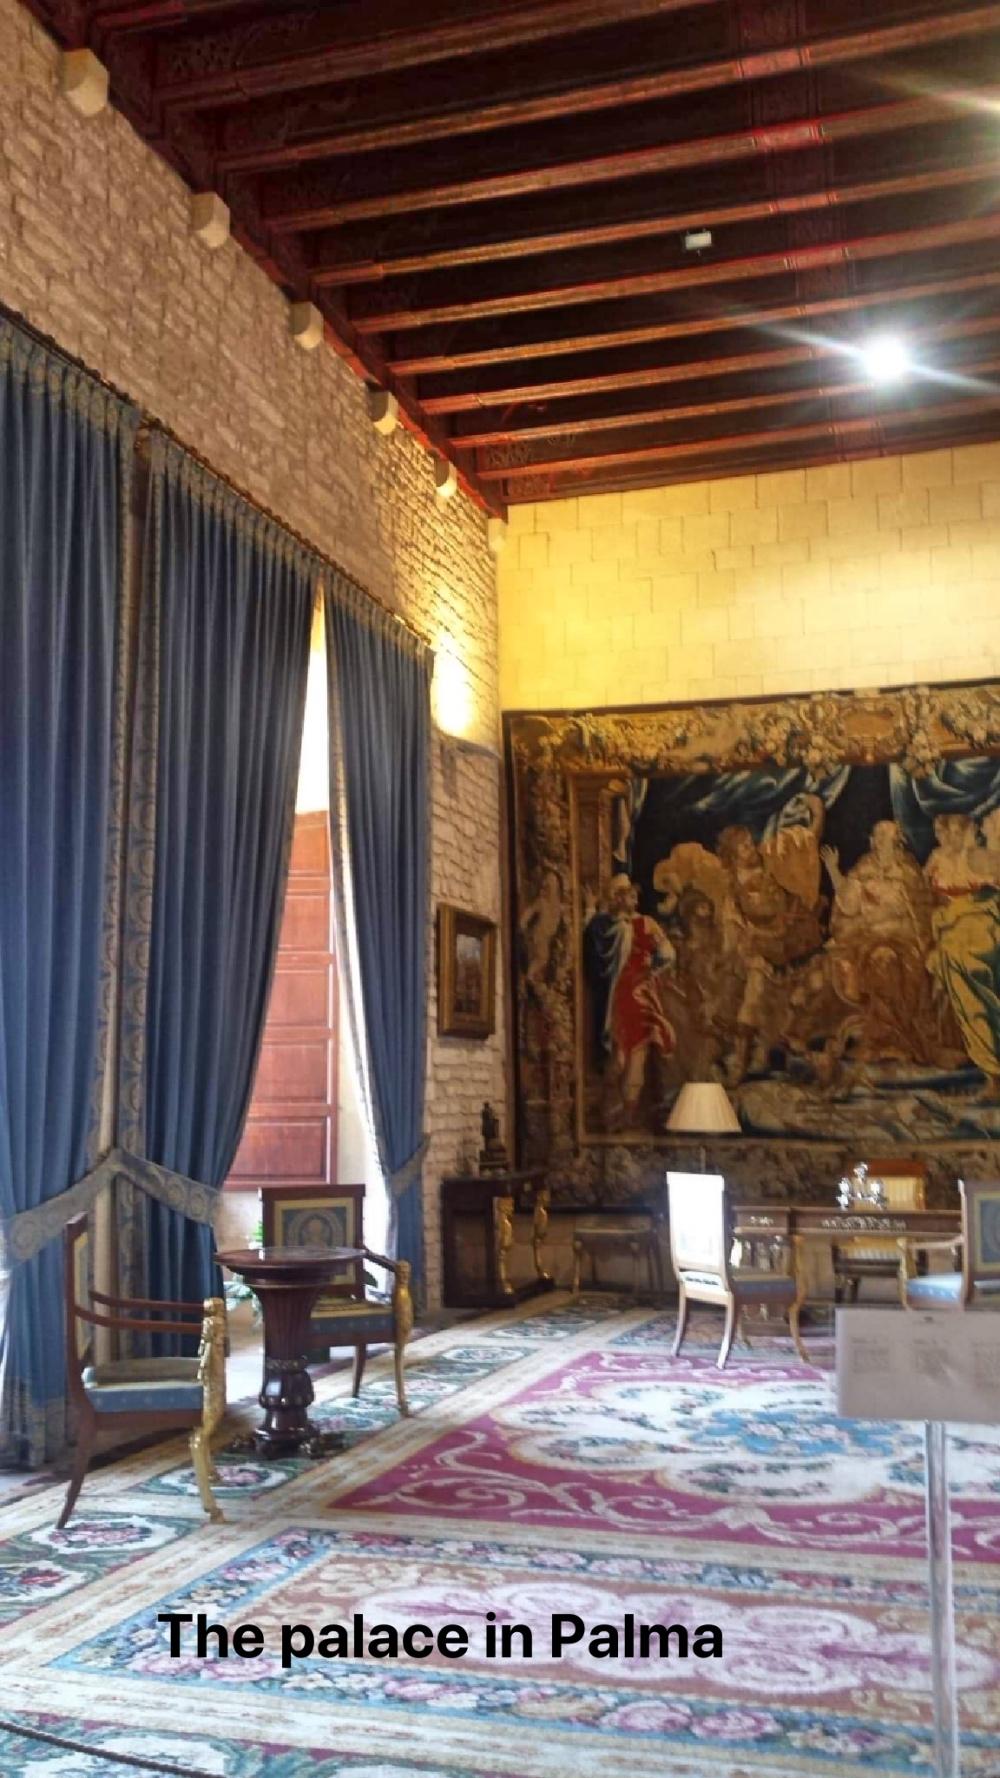 Palma palace.jpg